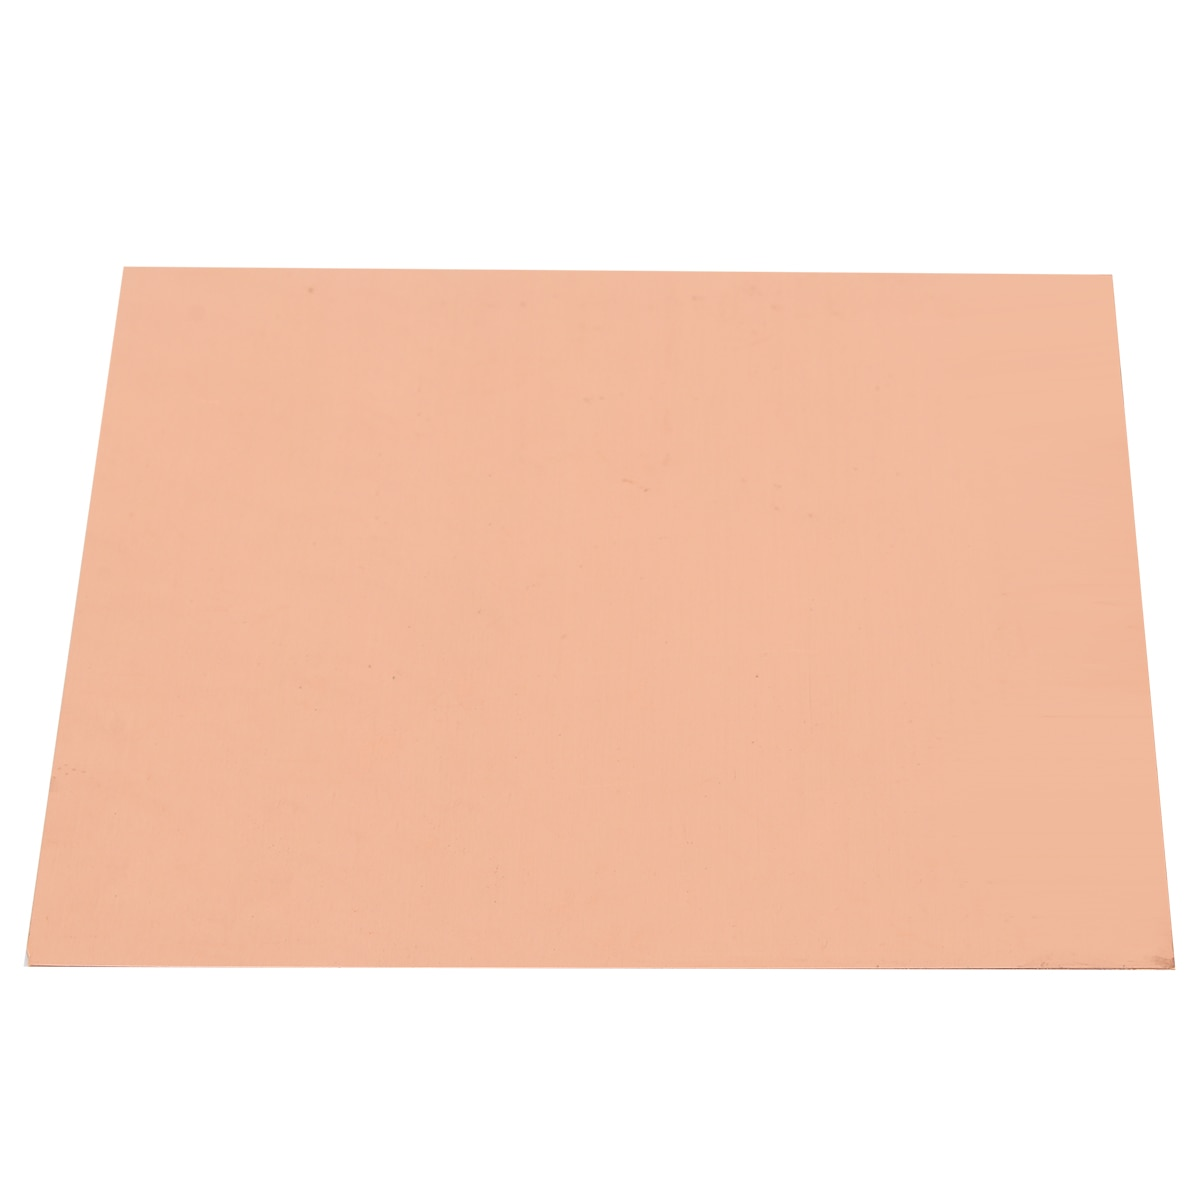 1 ud. 99.9% lámina de cobre de alta pureza Cu lámina de Metal plano placa de cobre puro para soldadura y soldadura 0,2*100*100mm